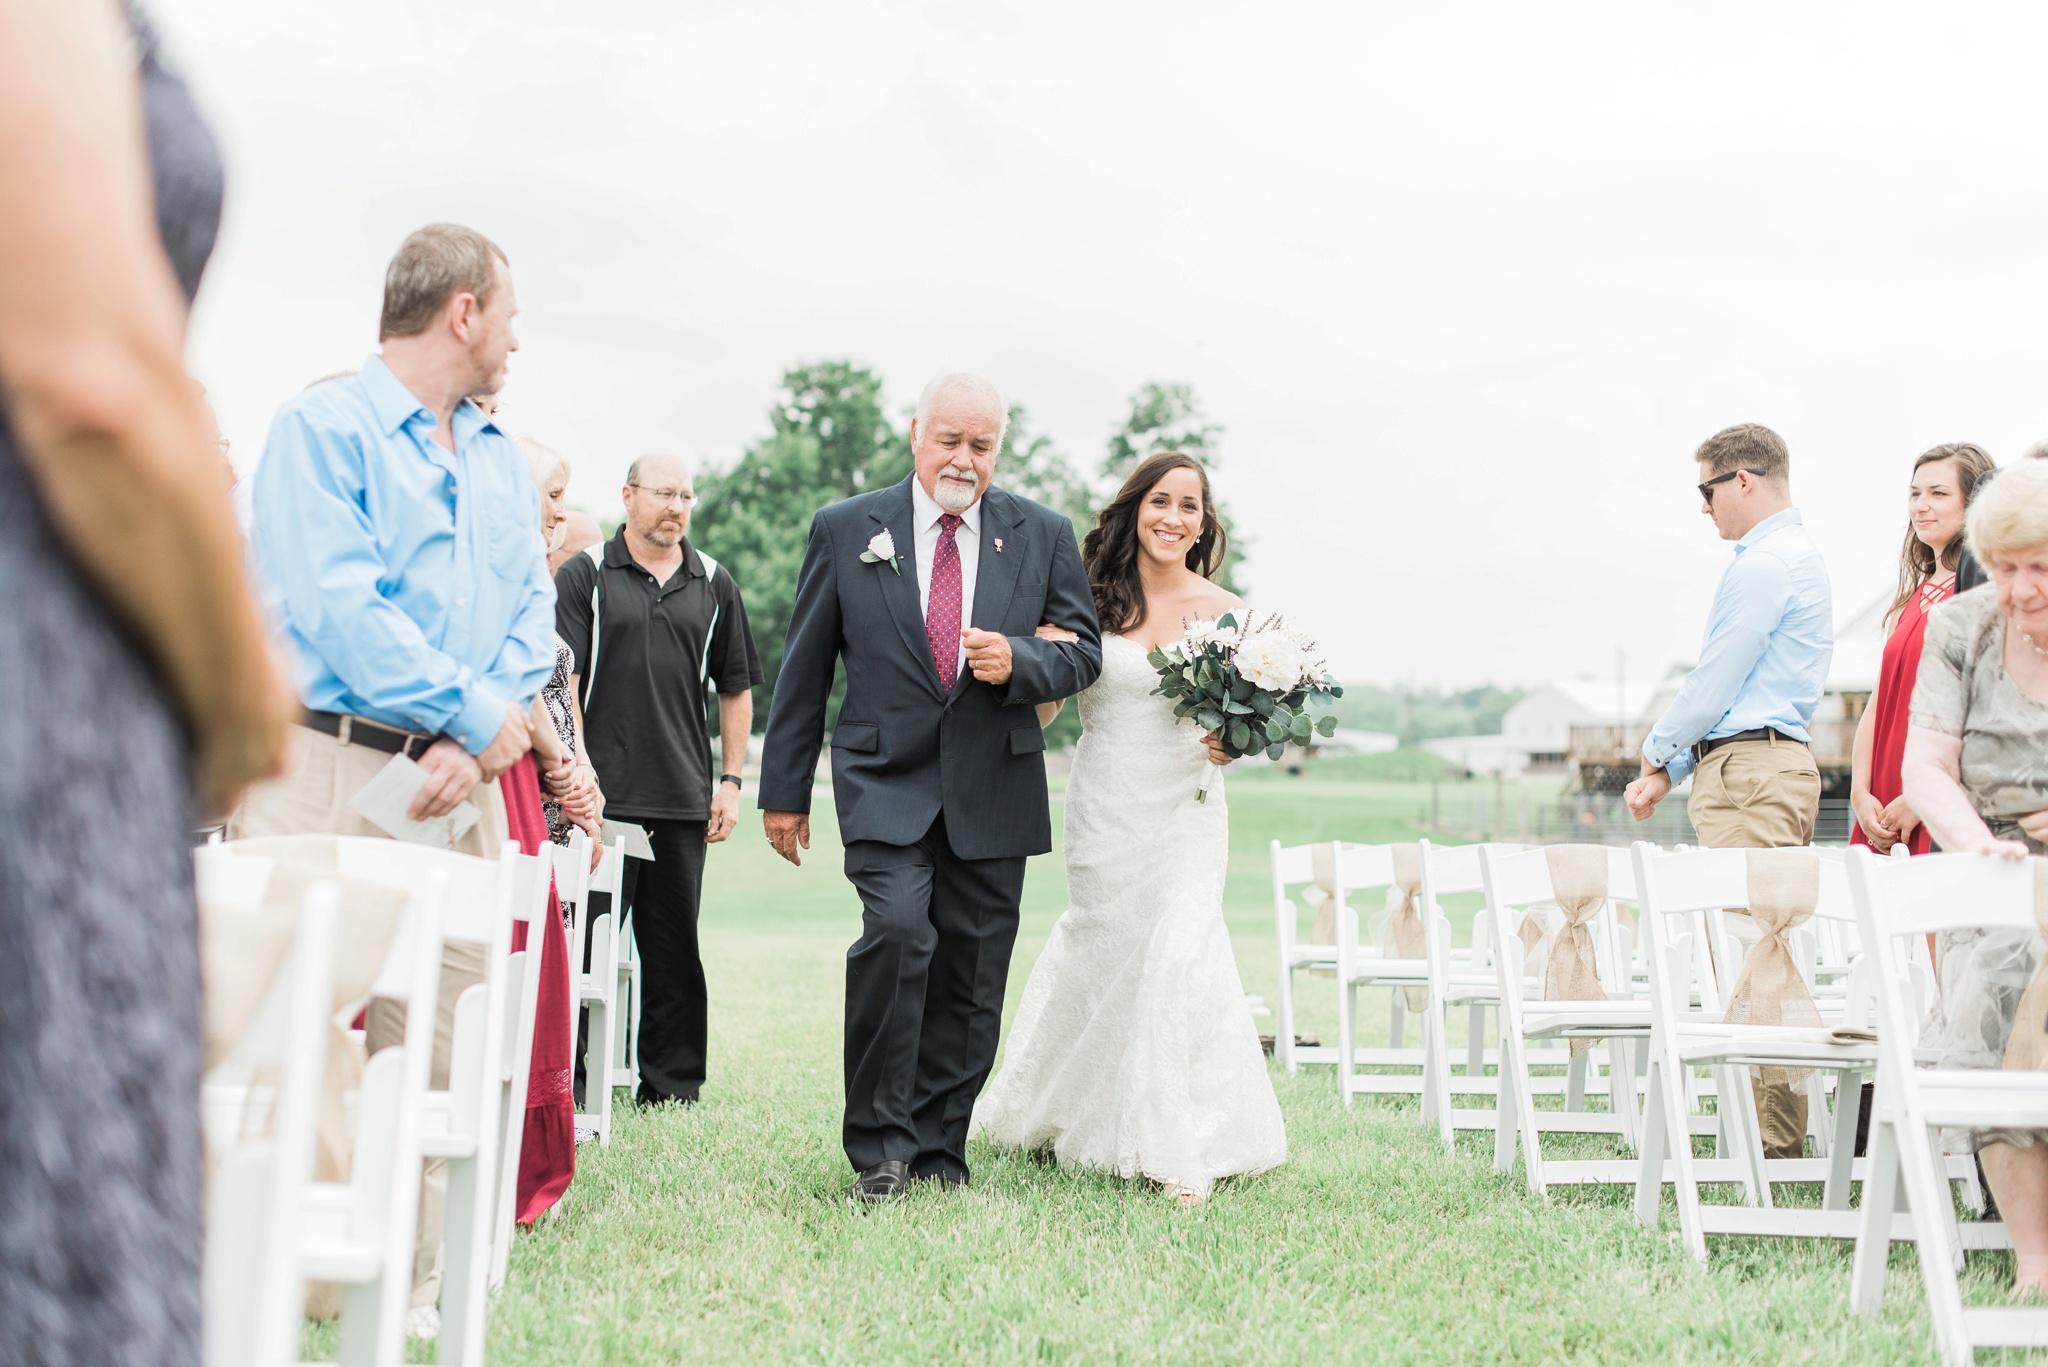 niederman-farm-wedding-cincinnati-ohio-photographer_0055.jpg